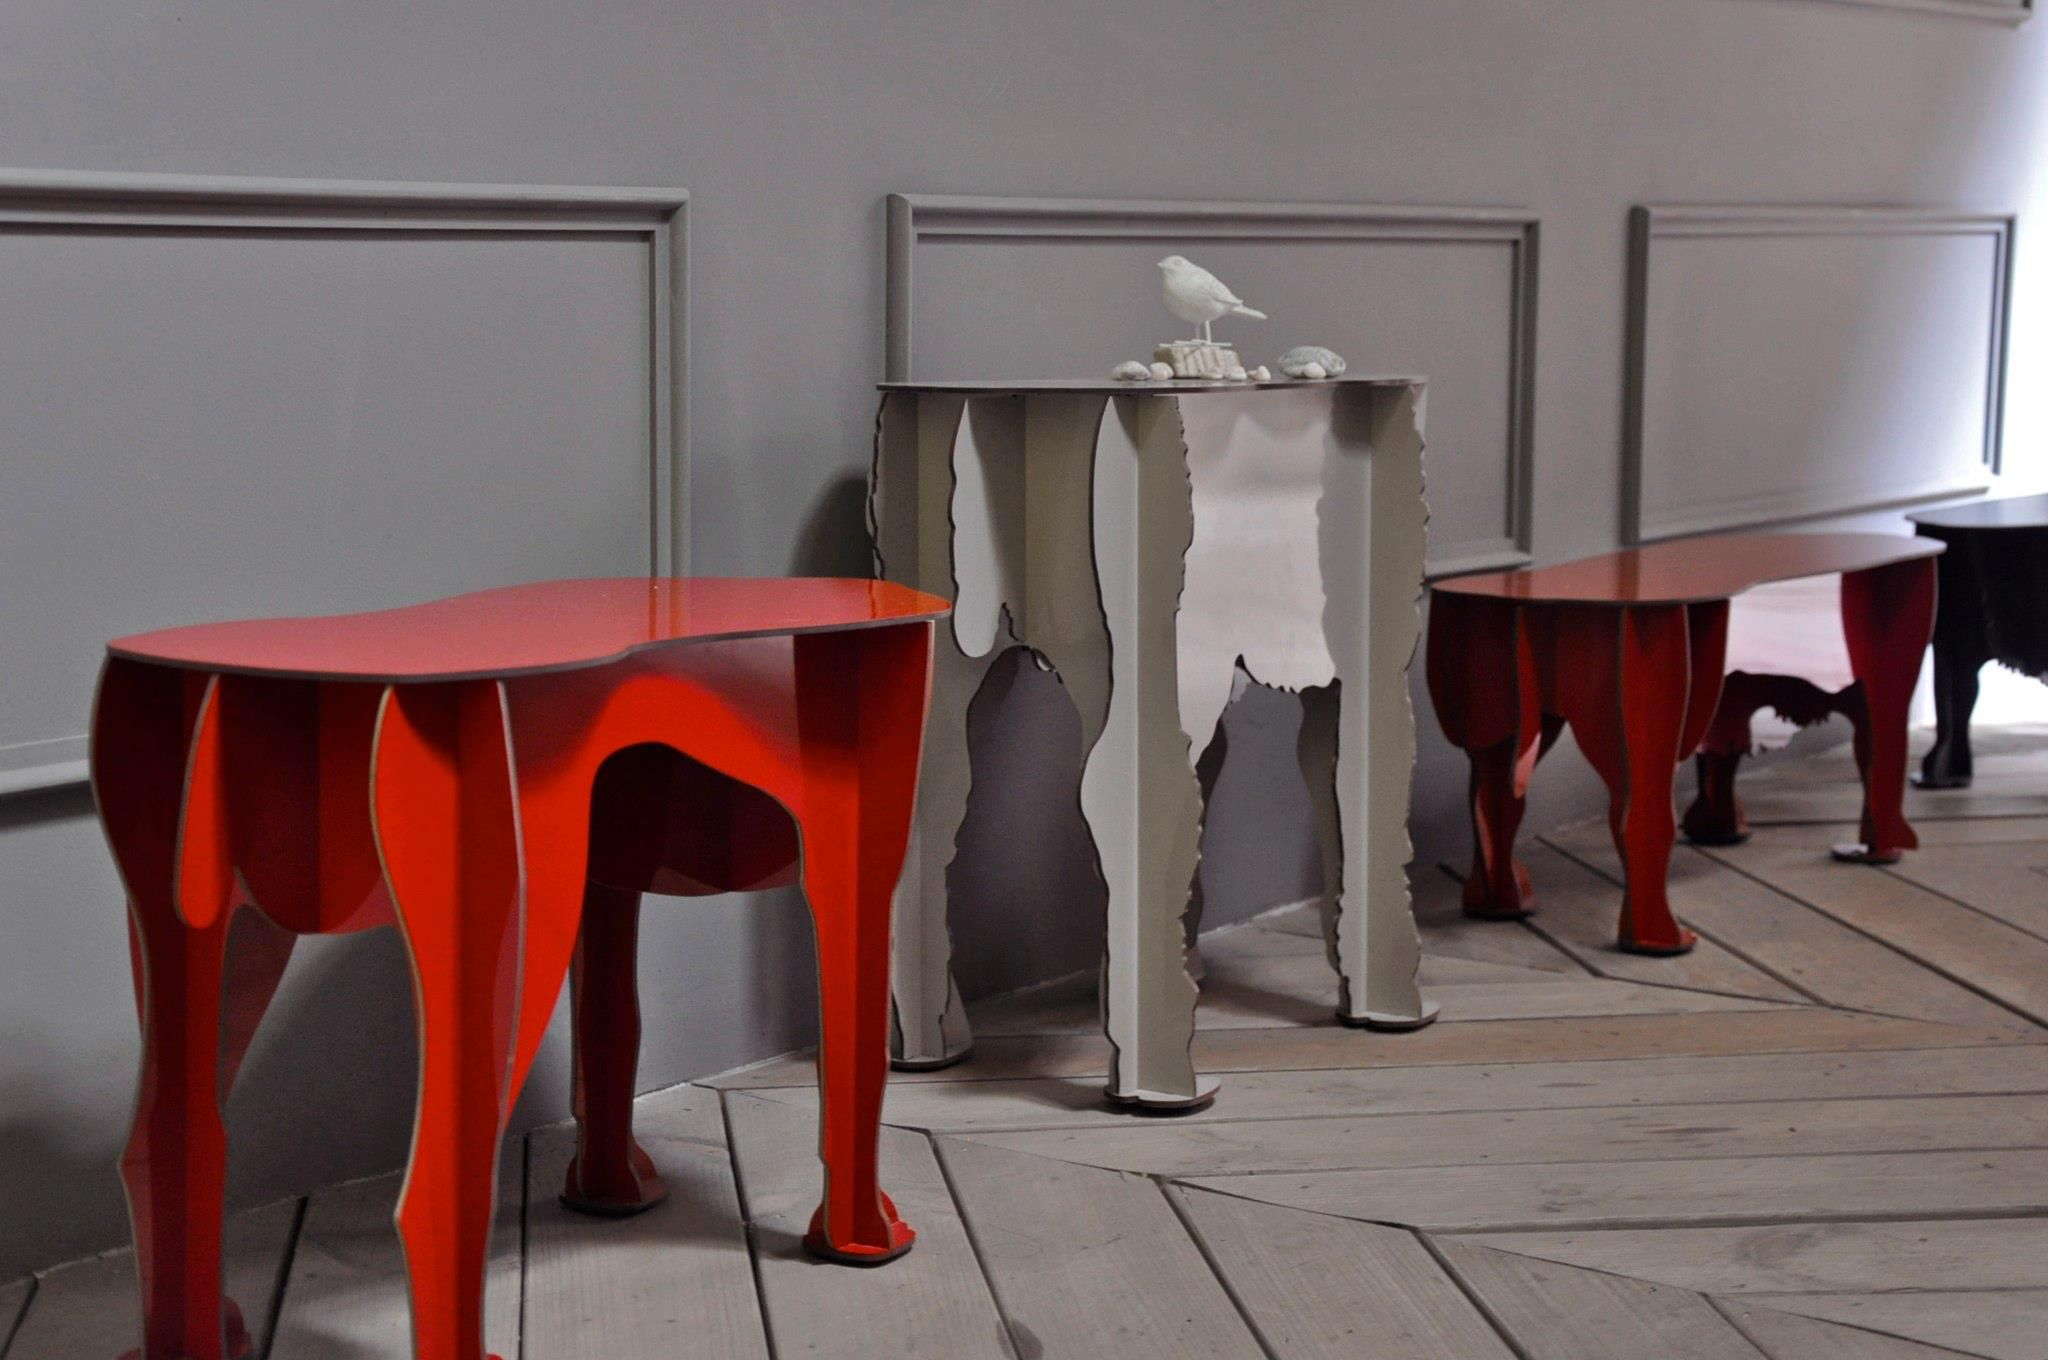 Sultan Dog Stool U0026 Scotty Lamb Stool By Ibride #ibride #design #interior #